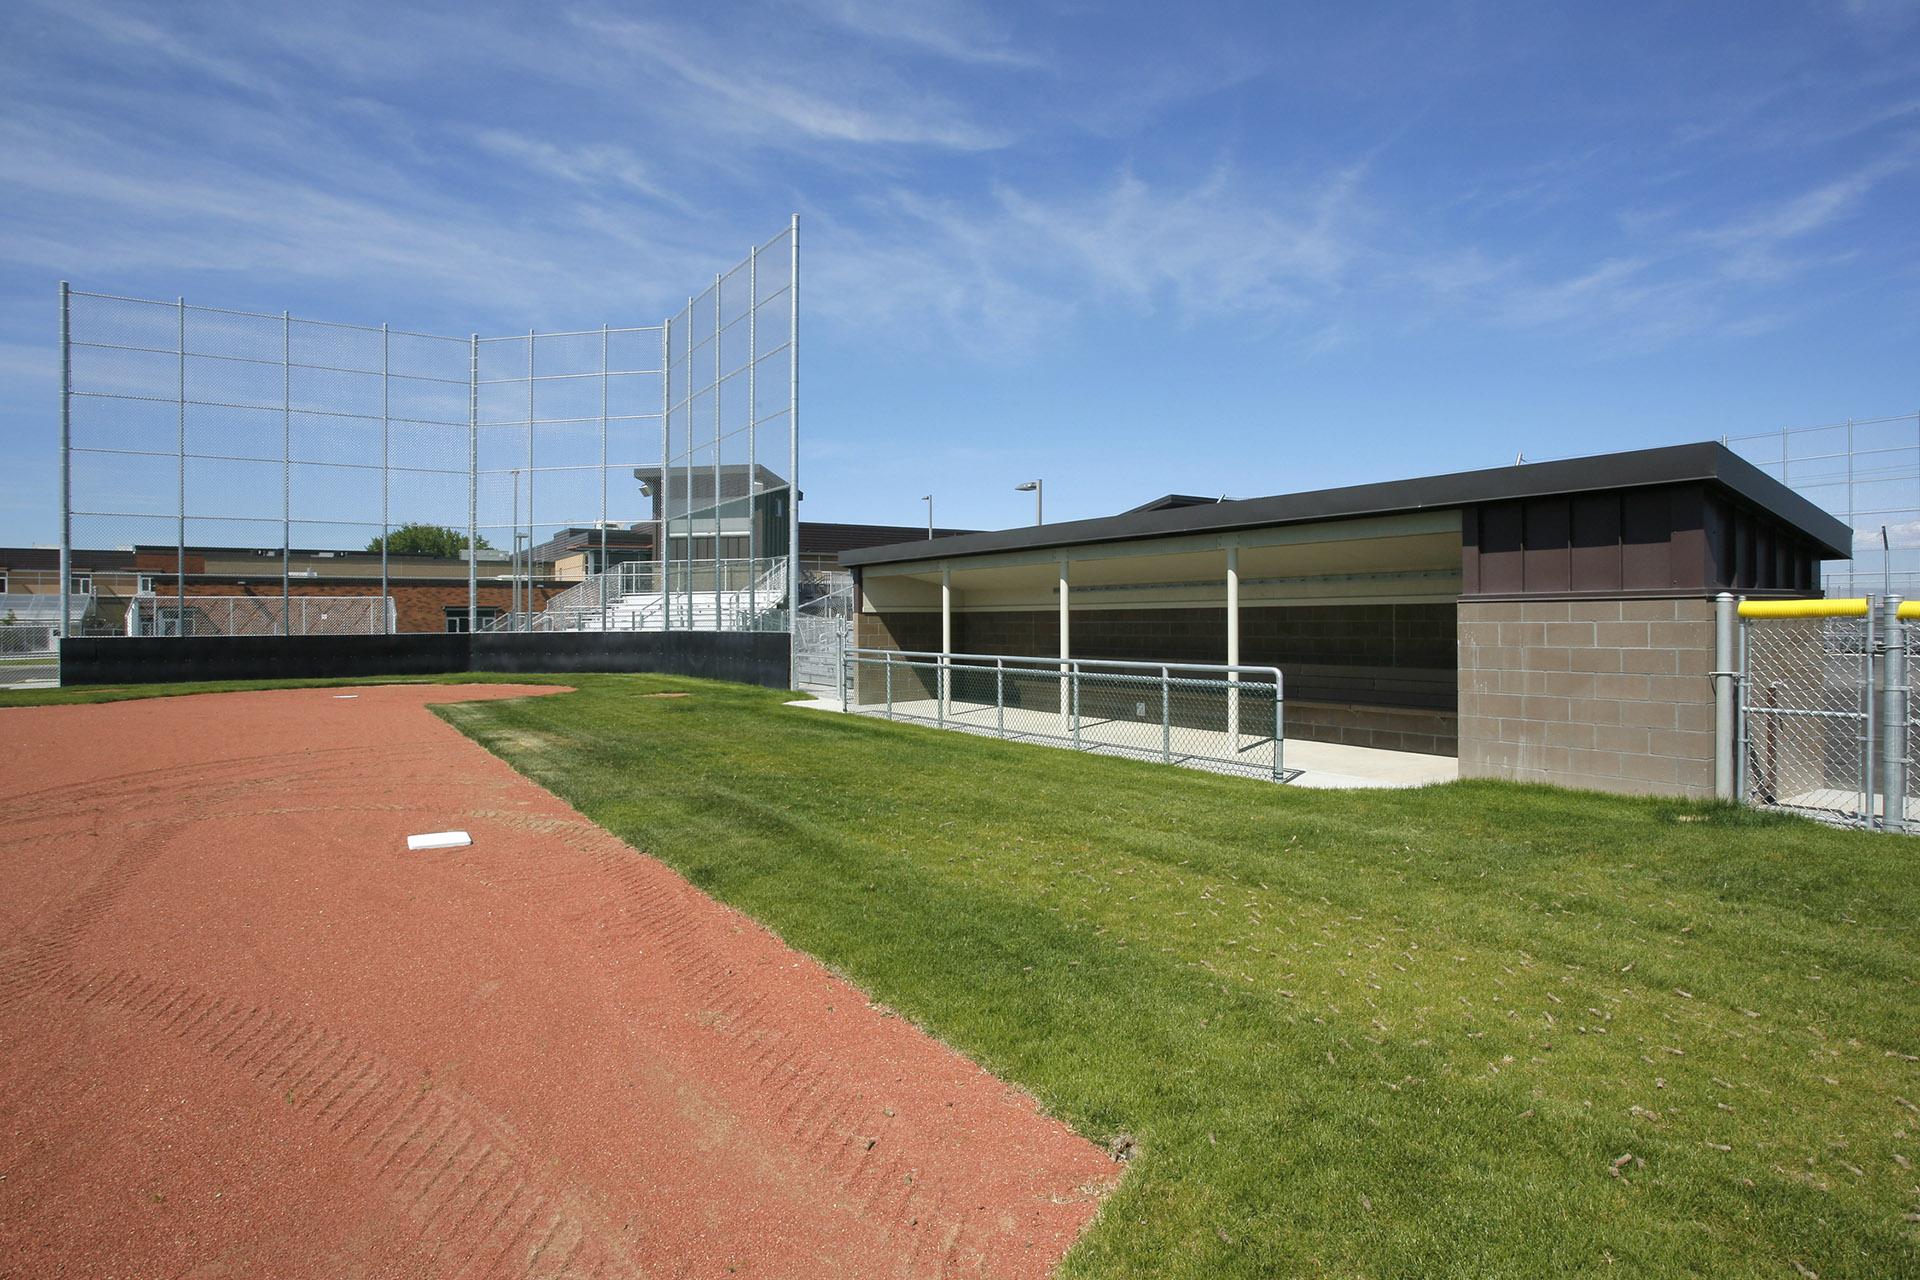 West Valley HS Baseball Field